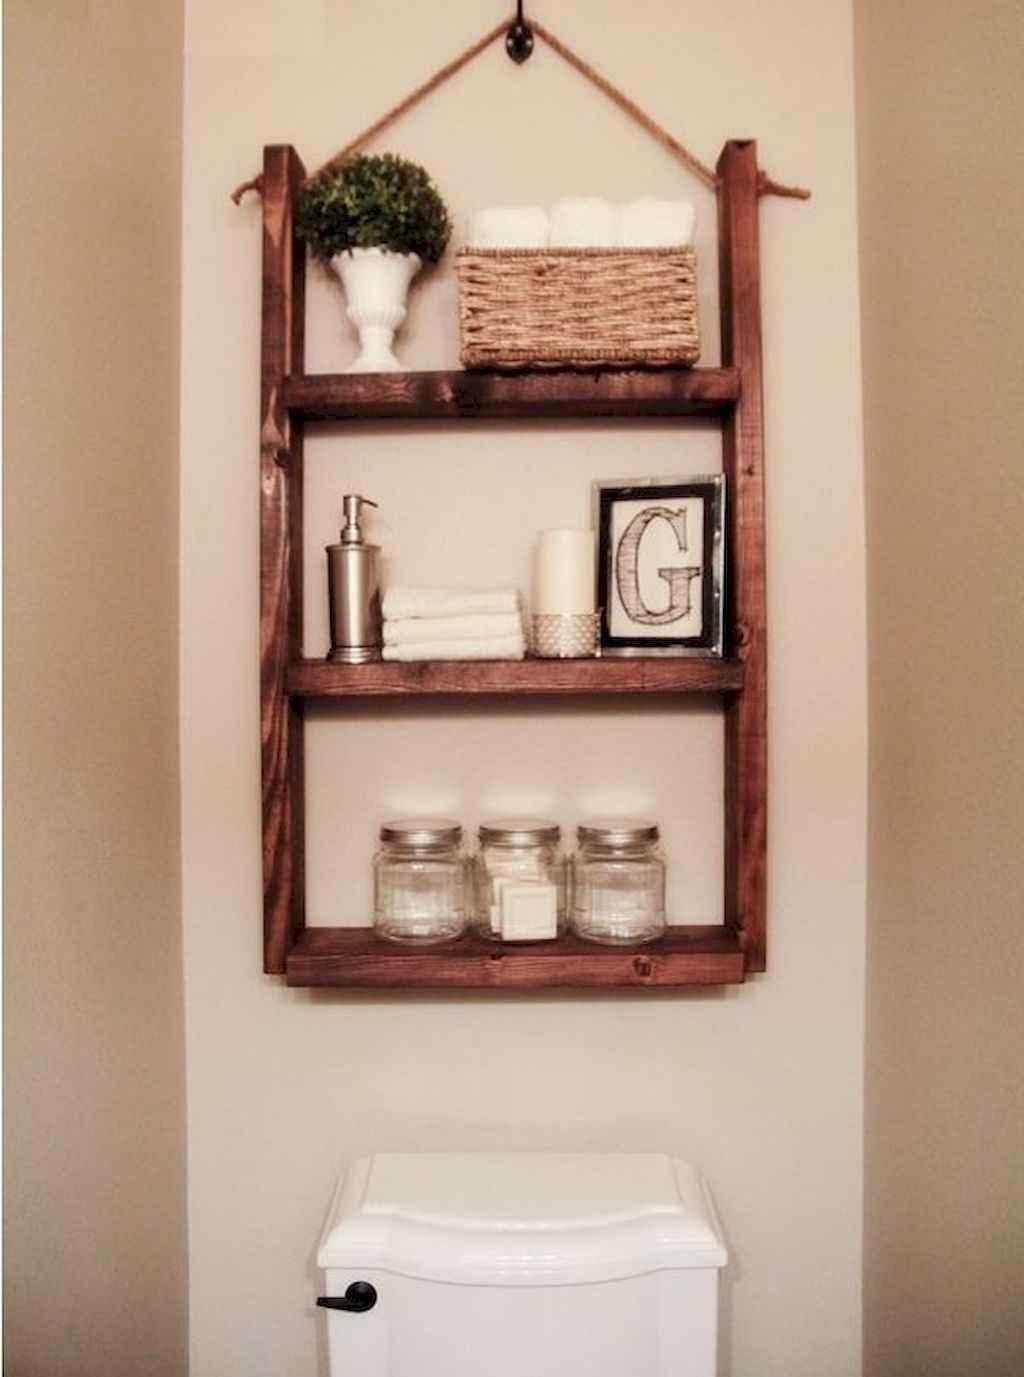 Cool bathroom storage shelves organization ideas (47)